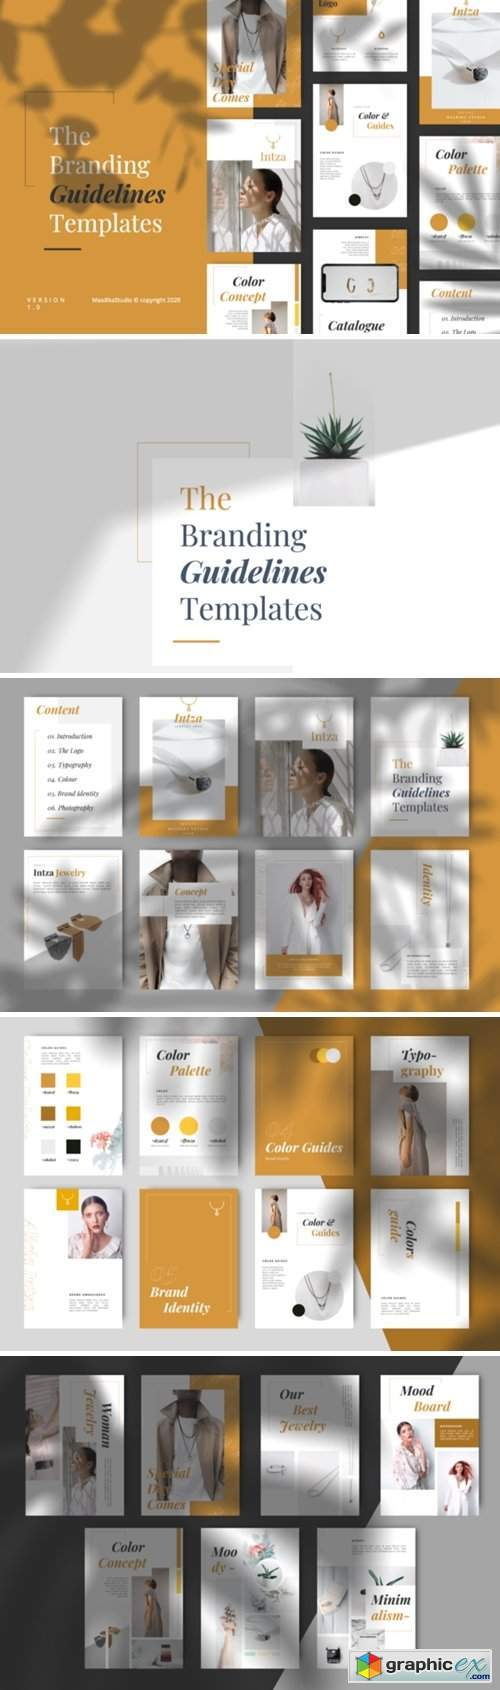 Intza Luxury Powerpoint Brand Guidelines